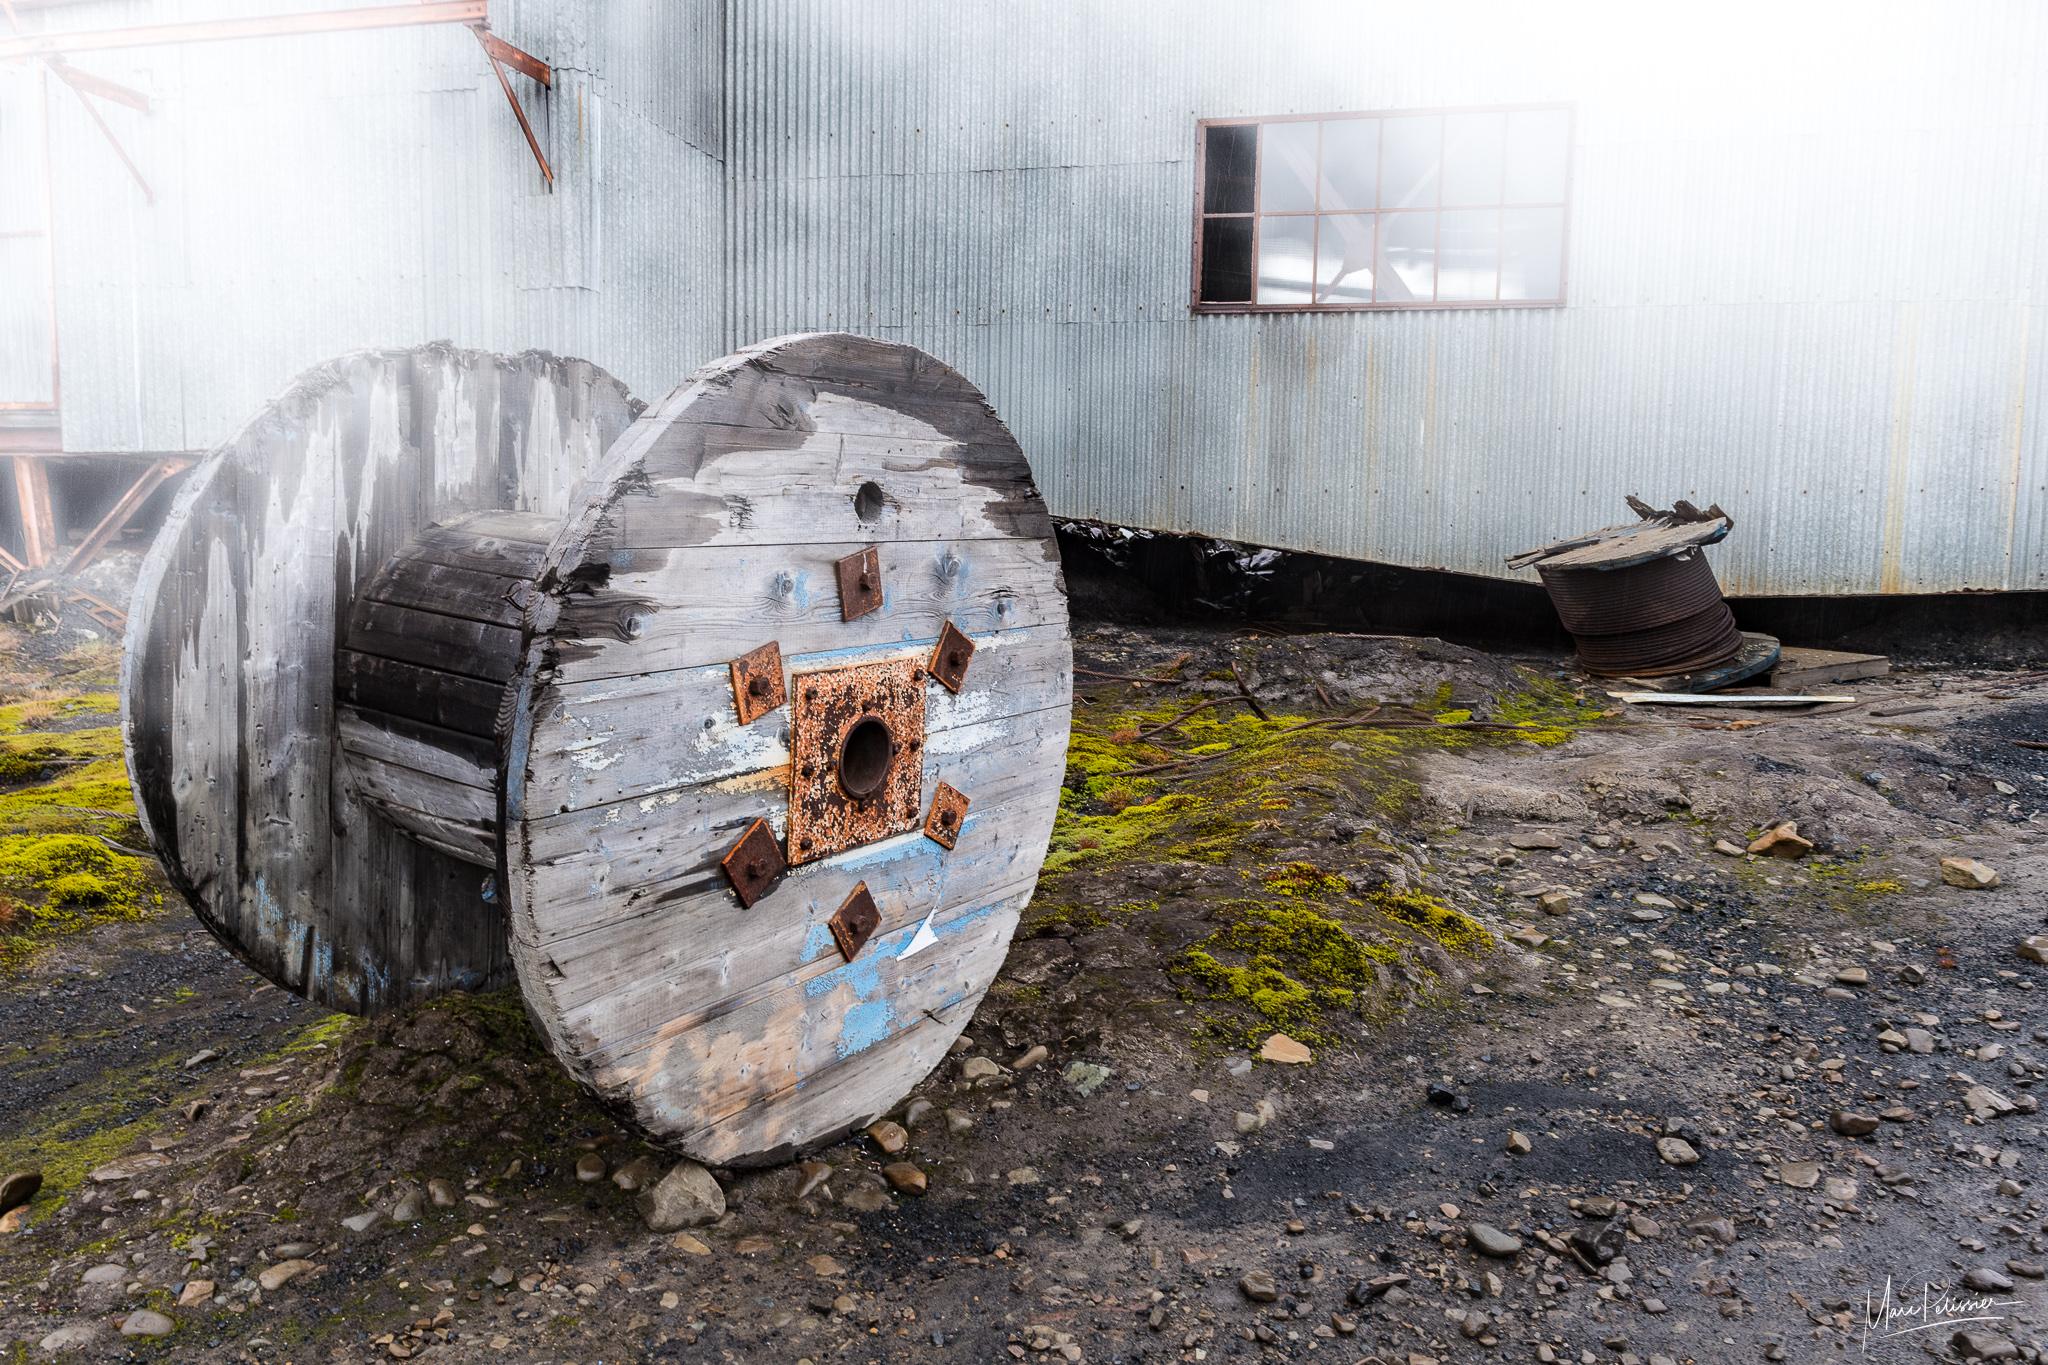 Abandonned arctic mine, Svalbard & Jan Mayen Islands